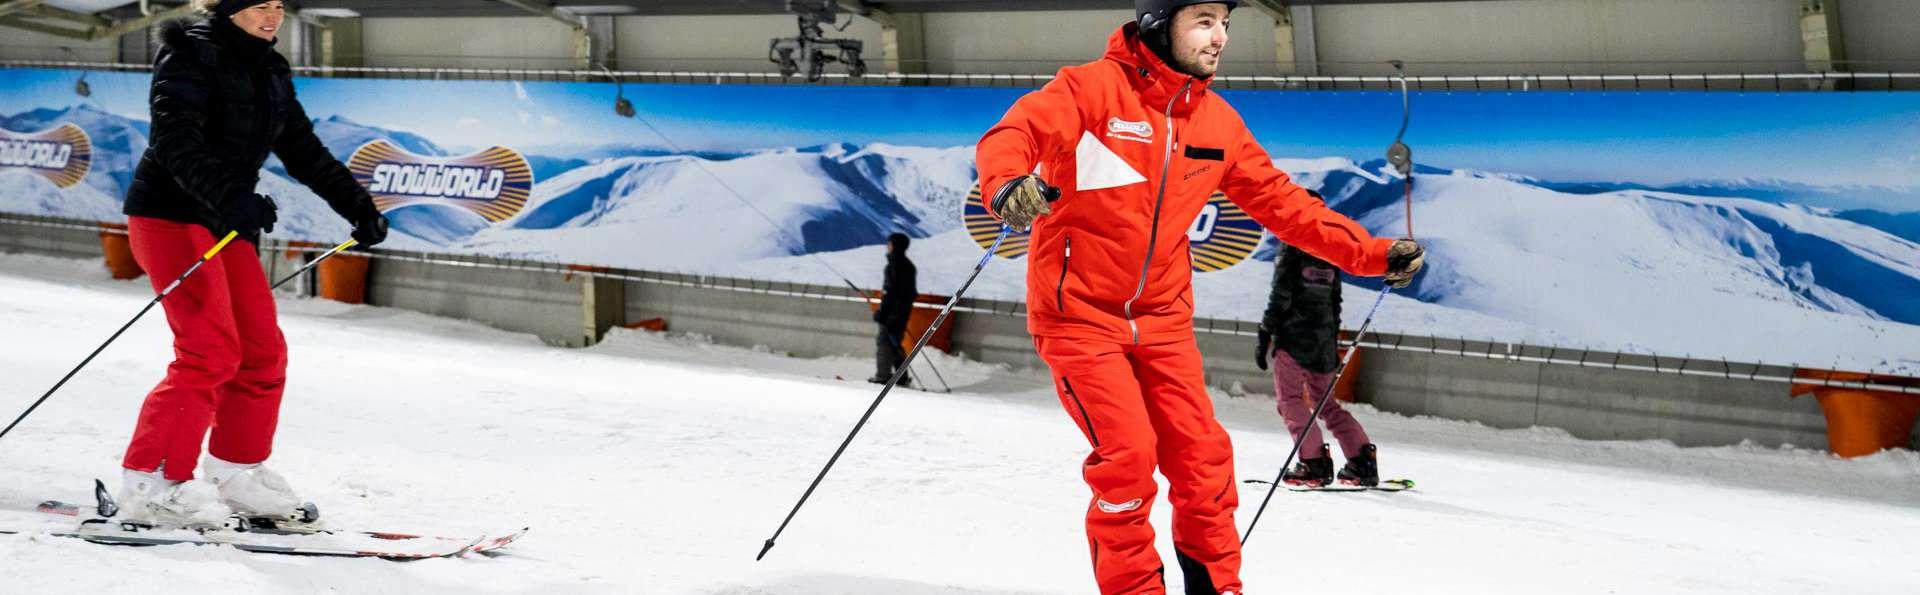 Sports d'hiver à Landgraaf